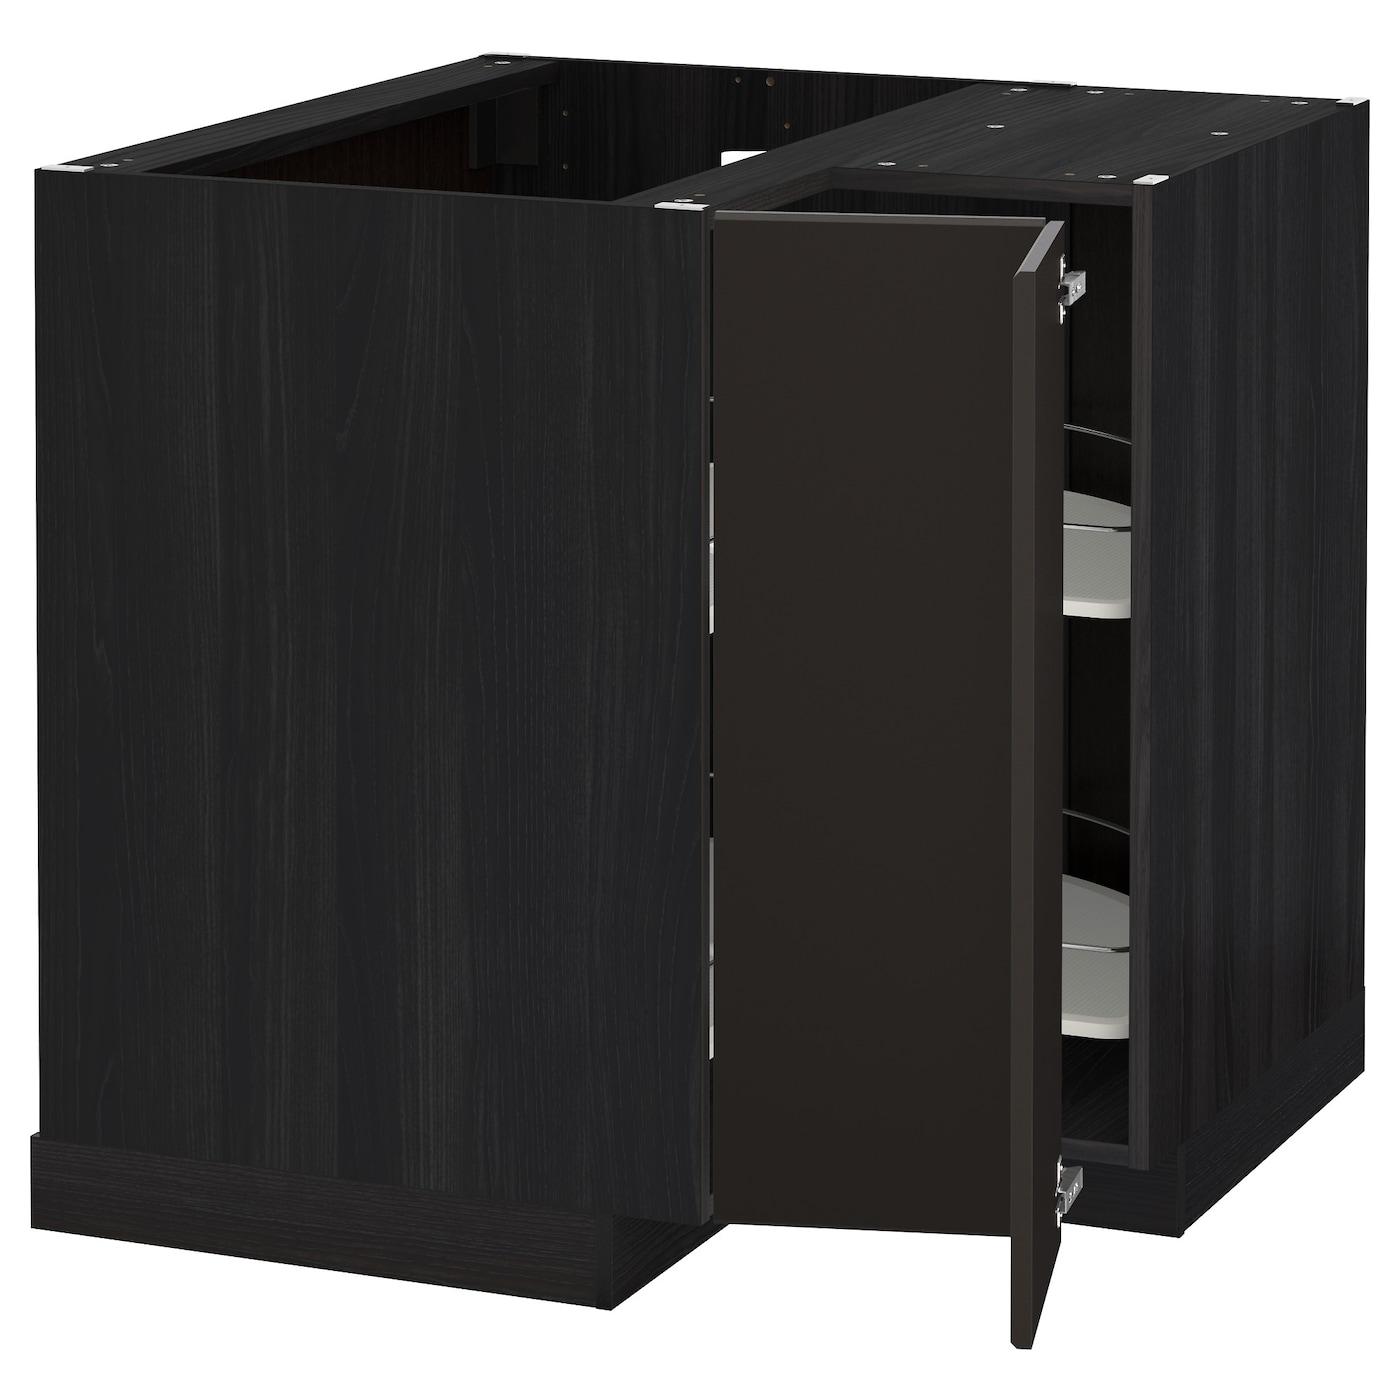 METOD Corner base cabinet with carousel Black kungsbacka